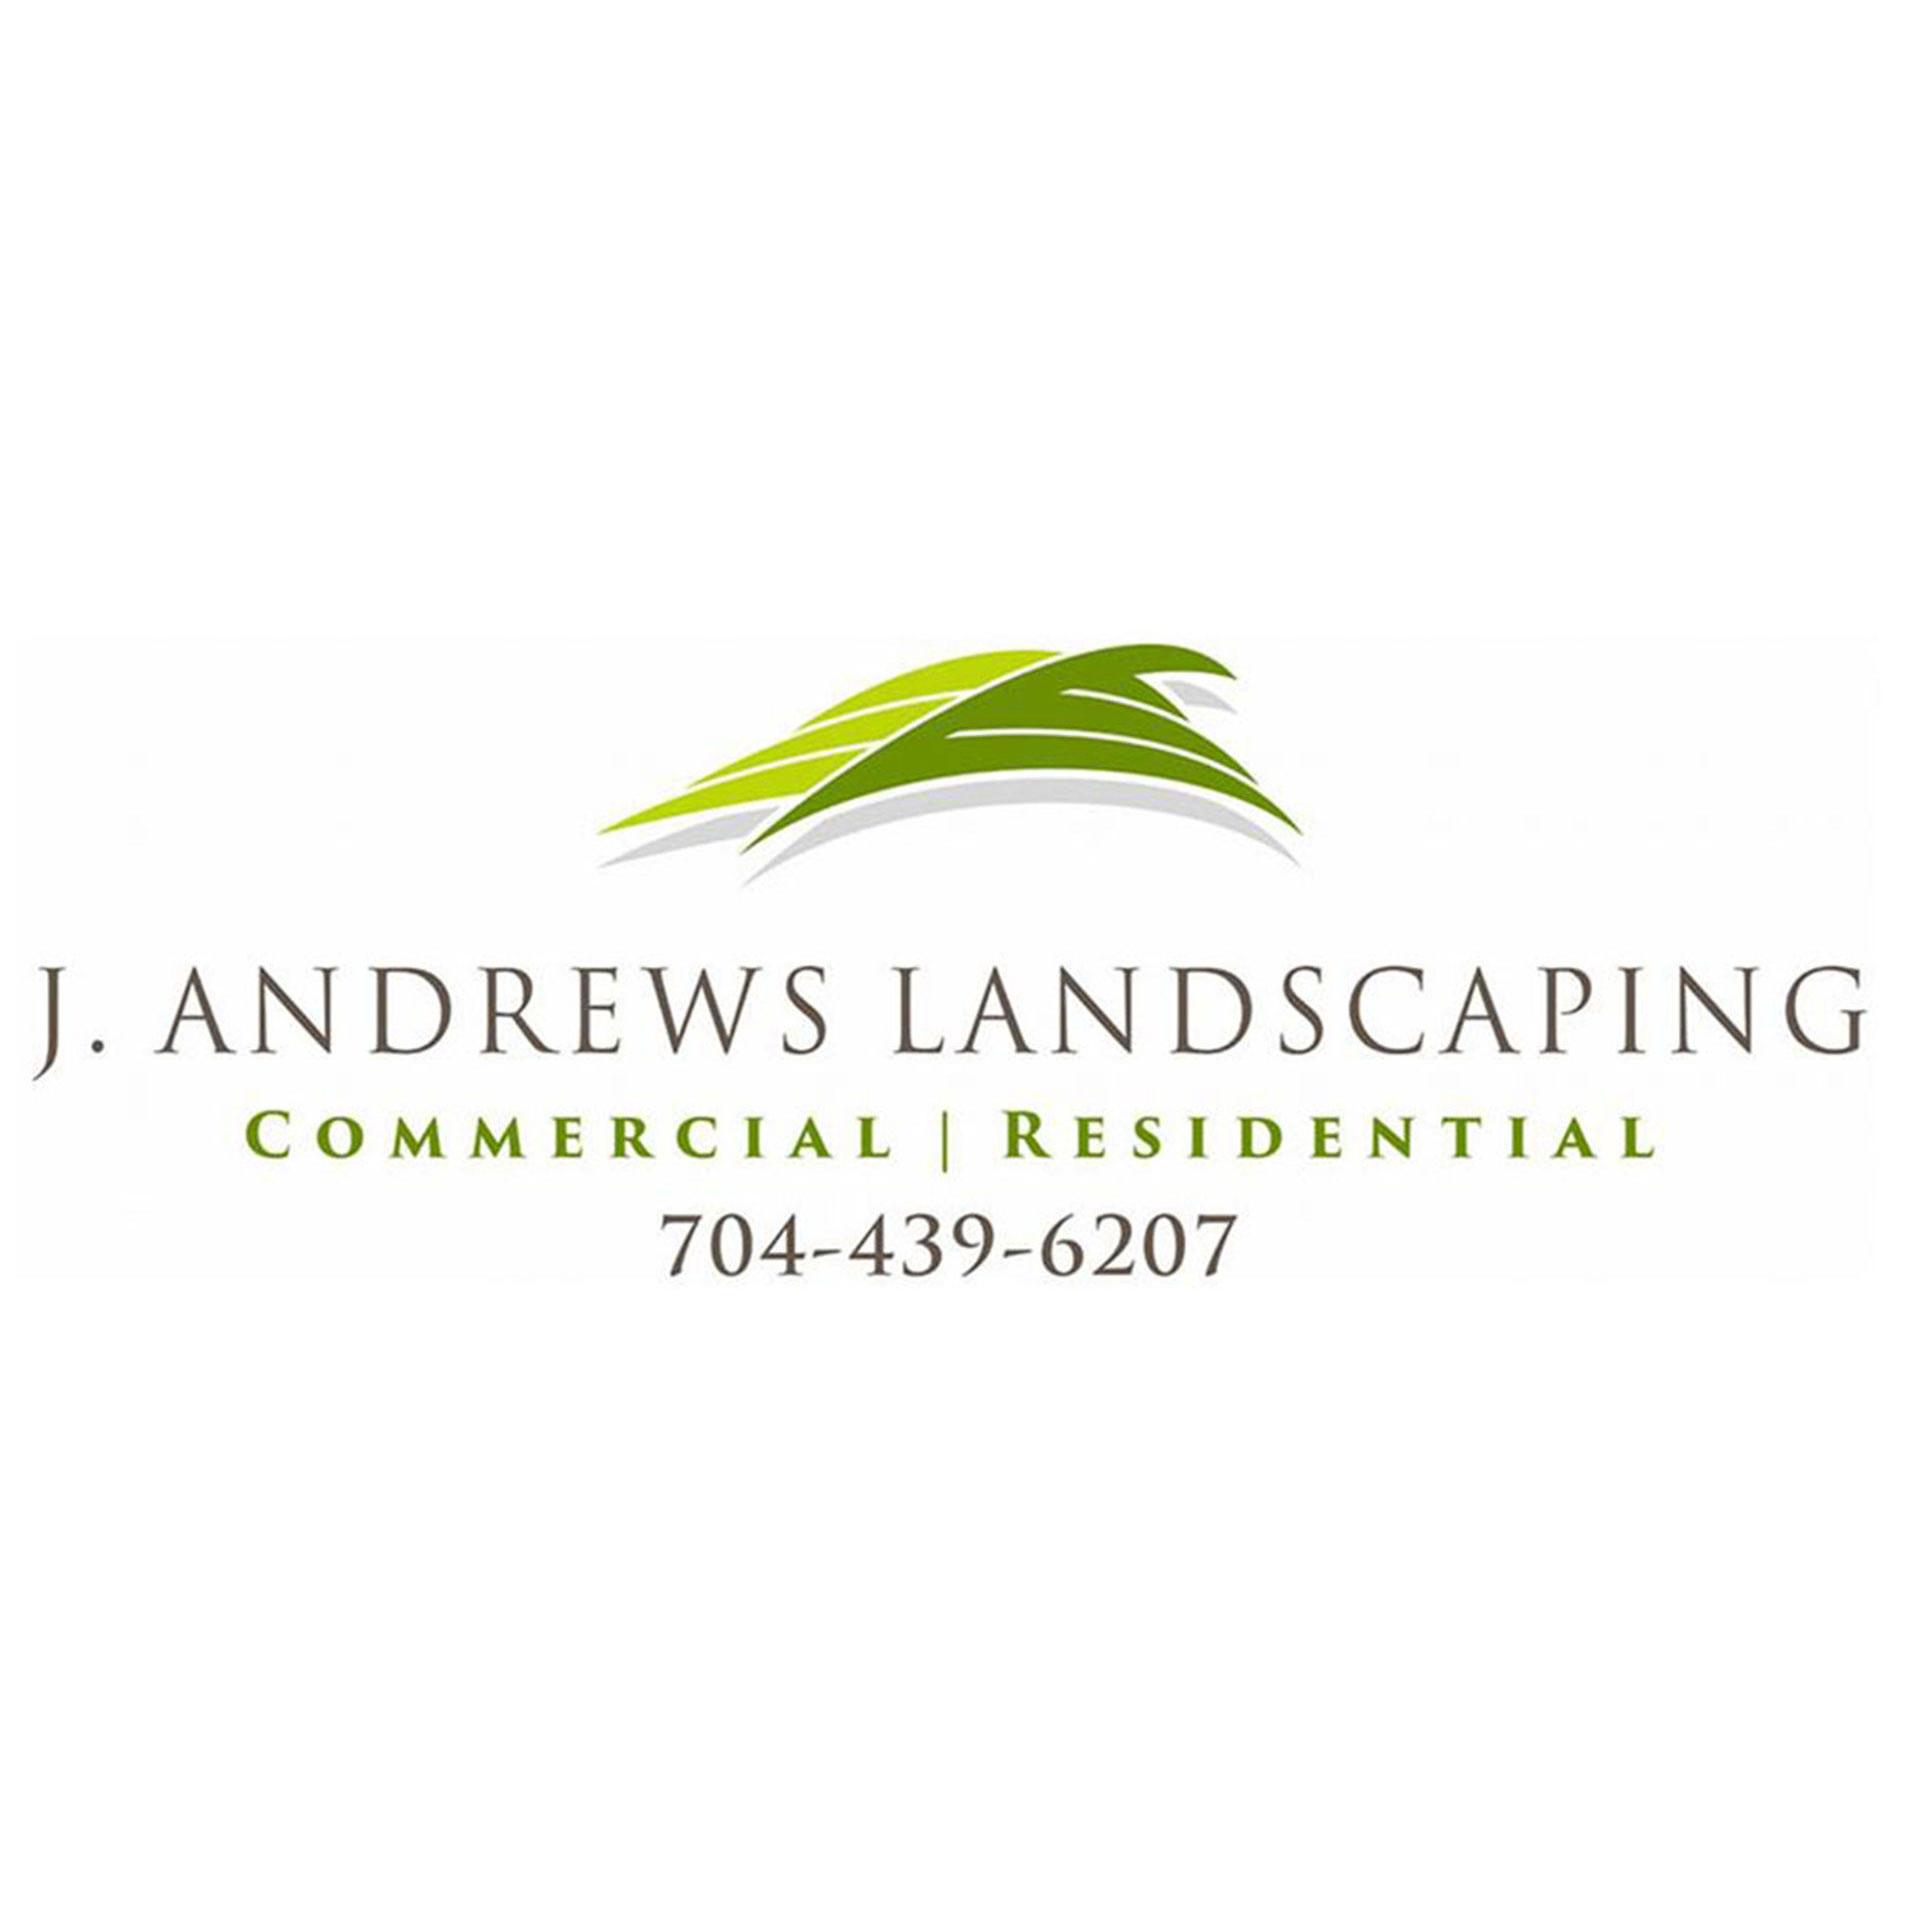 J. Andrews Landscaping